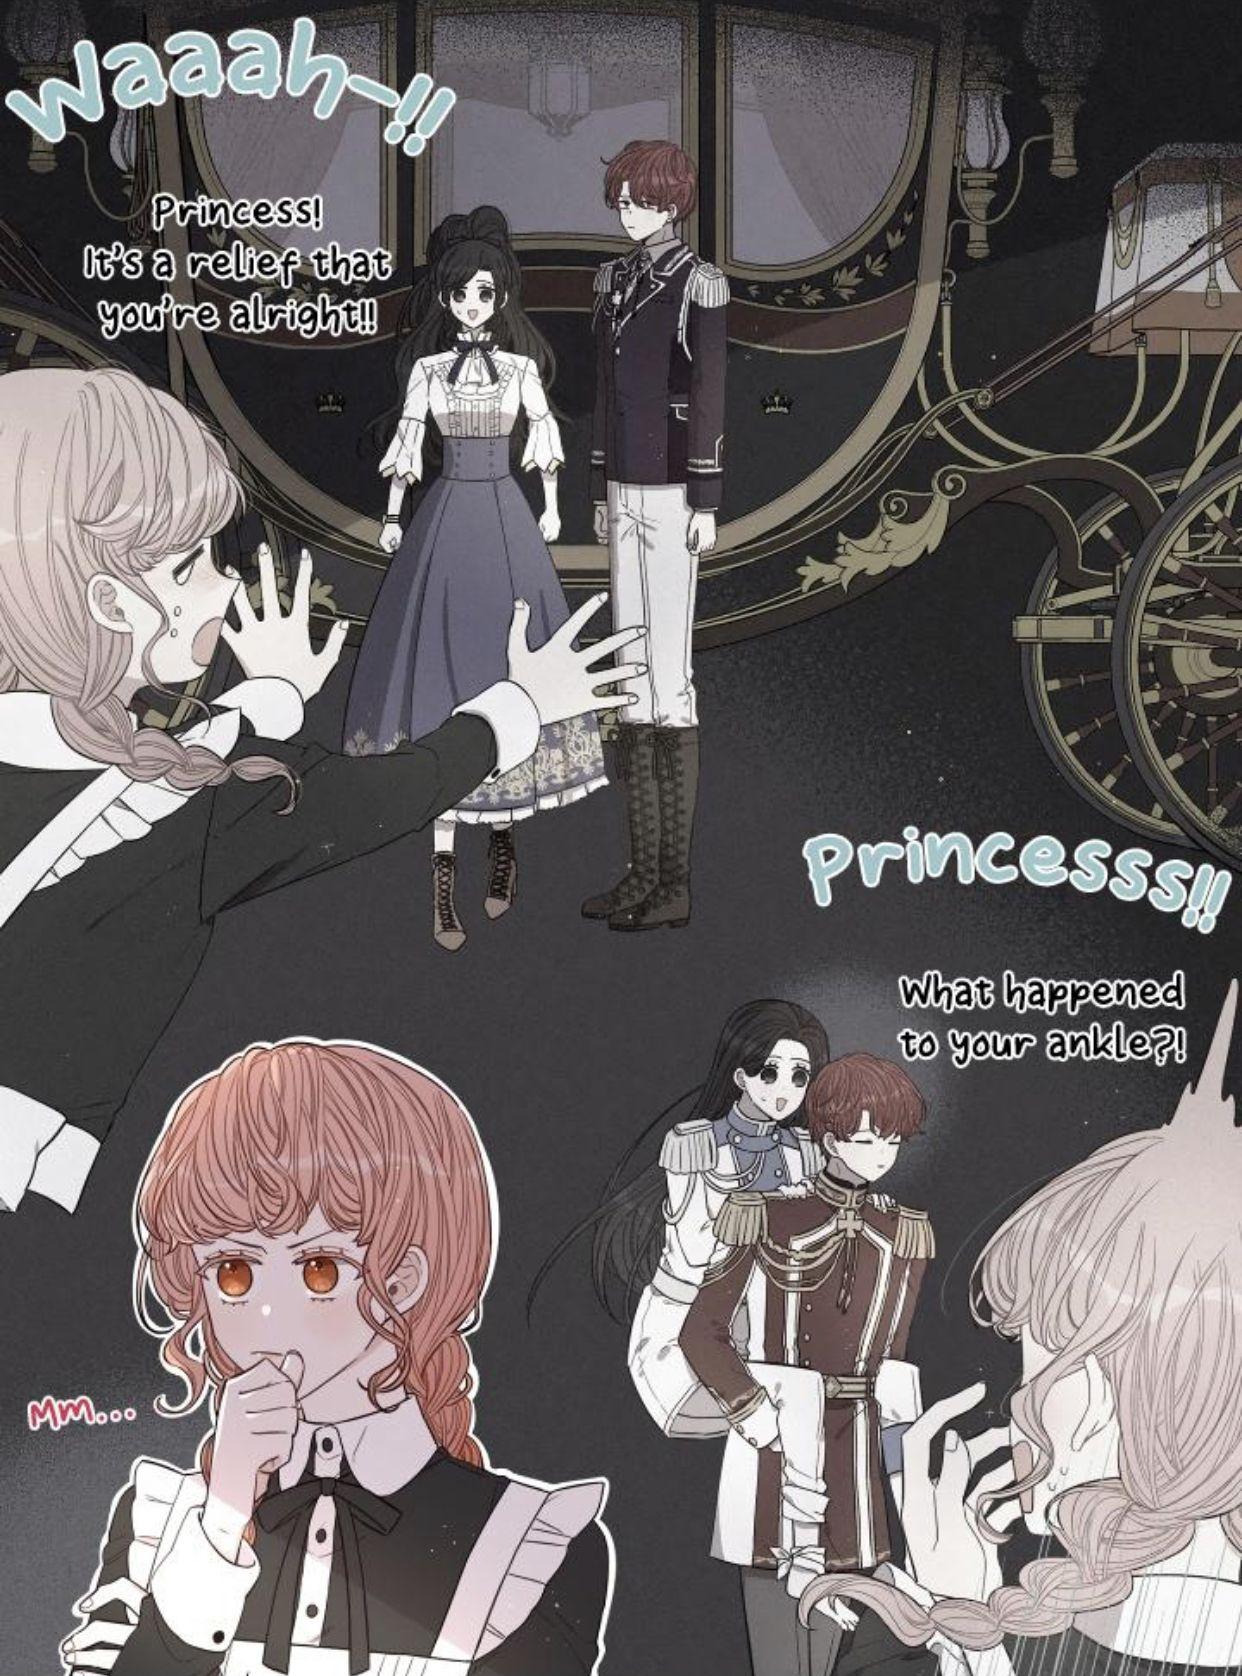 Chap 20 in 2020 Getting divorced, Anime, Manga anime